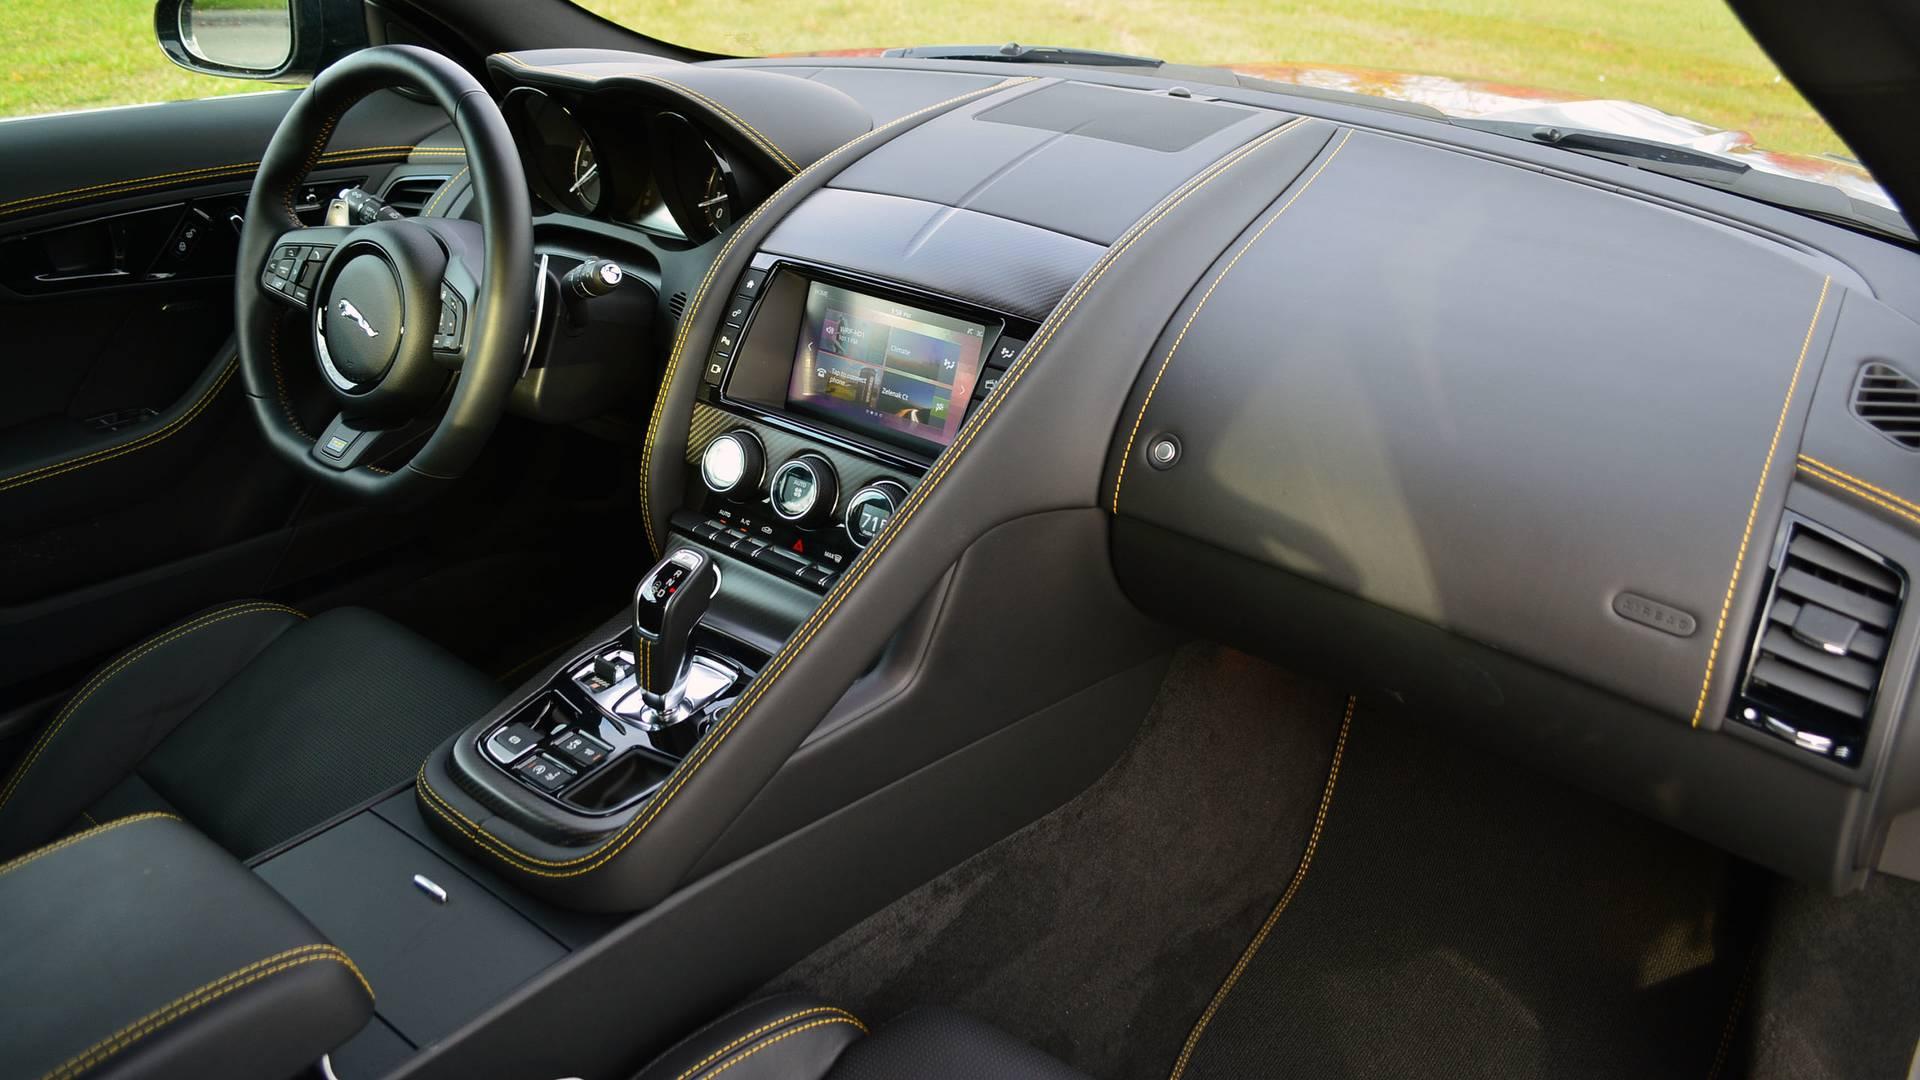 5a1d4bcfc3d6f 2018 jaguar f type sport 400 review جگوار F Type مدل ۲۰۱۸ رونمایی شد با عکس های جدید و زیبا   اجاره ماشین